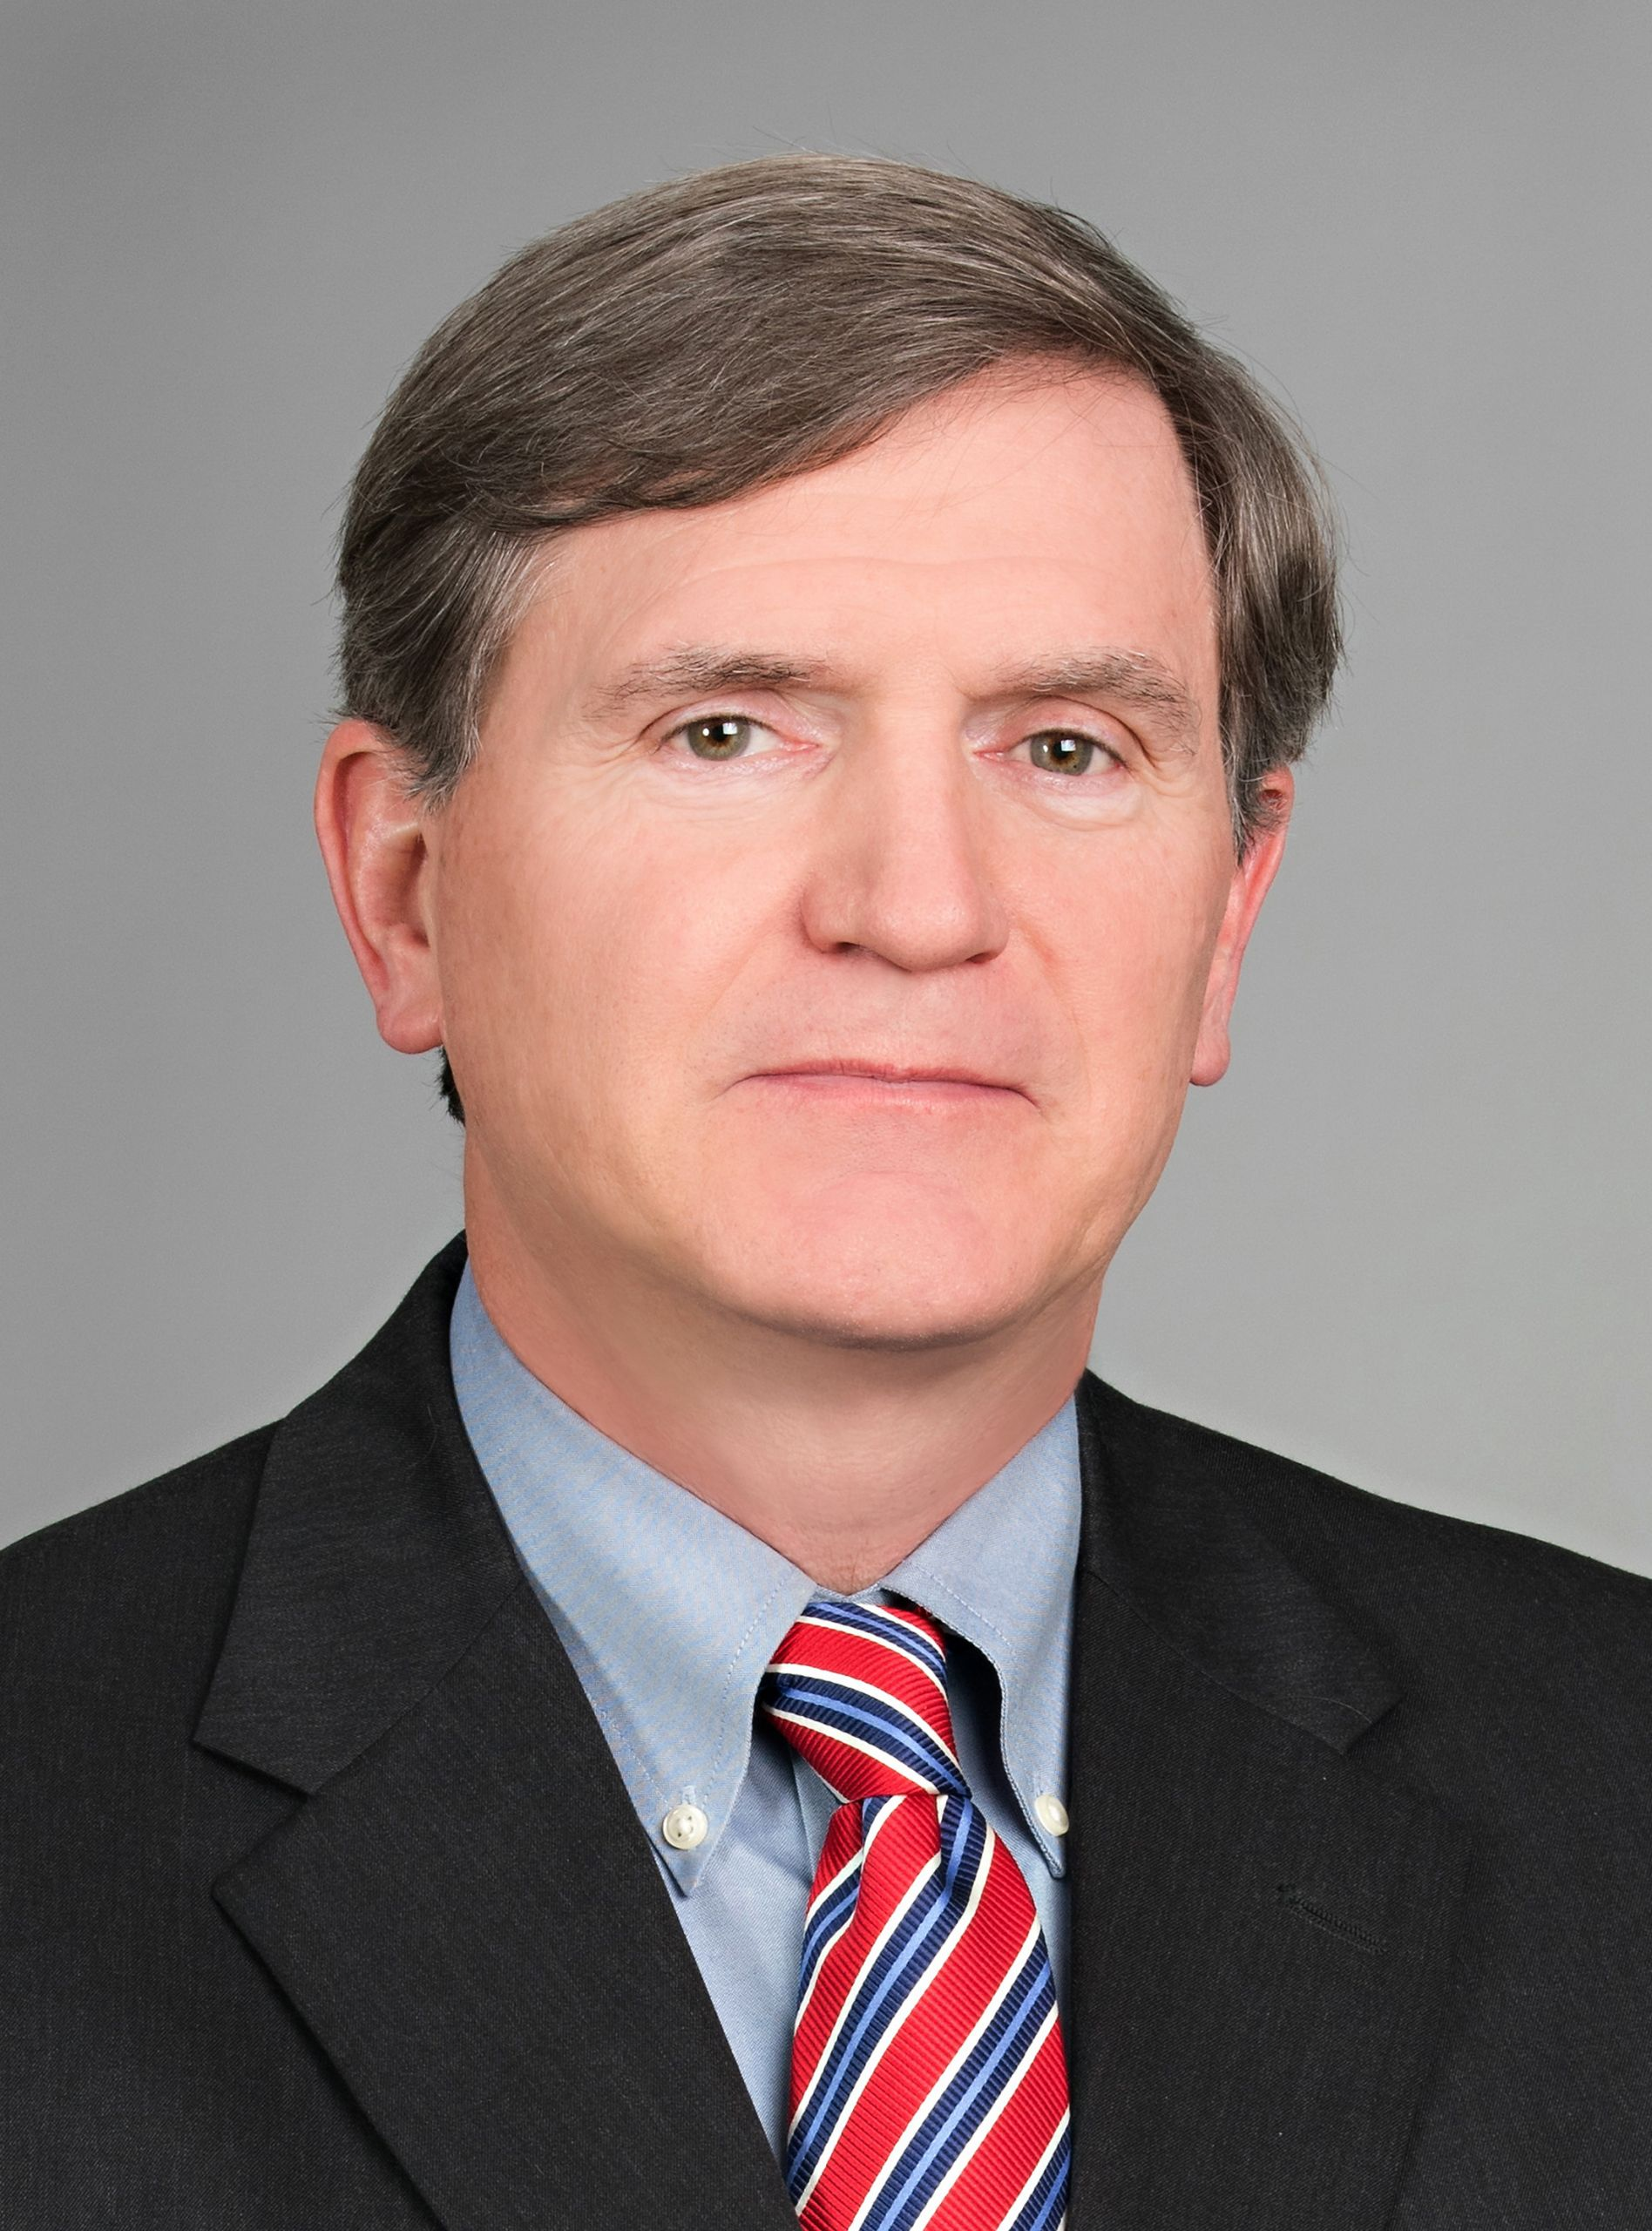 Mark W. Merritt '79